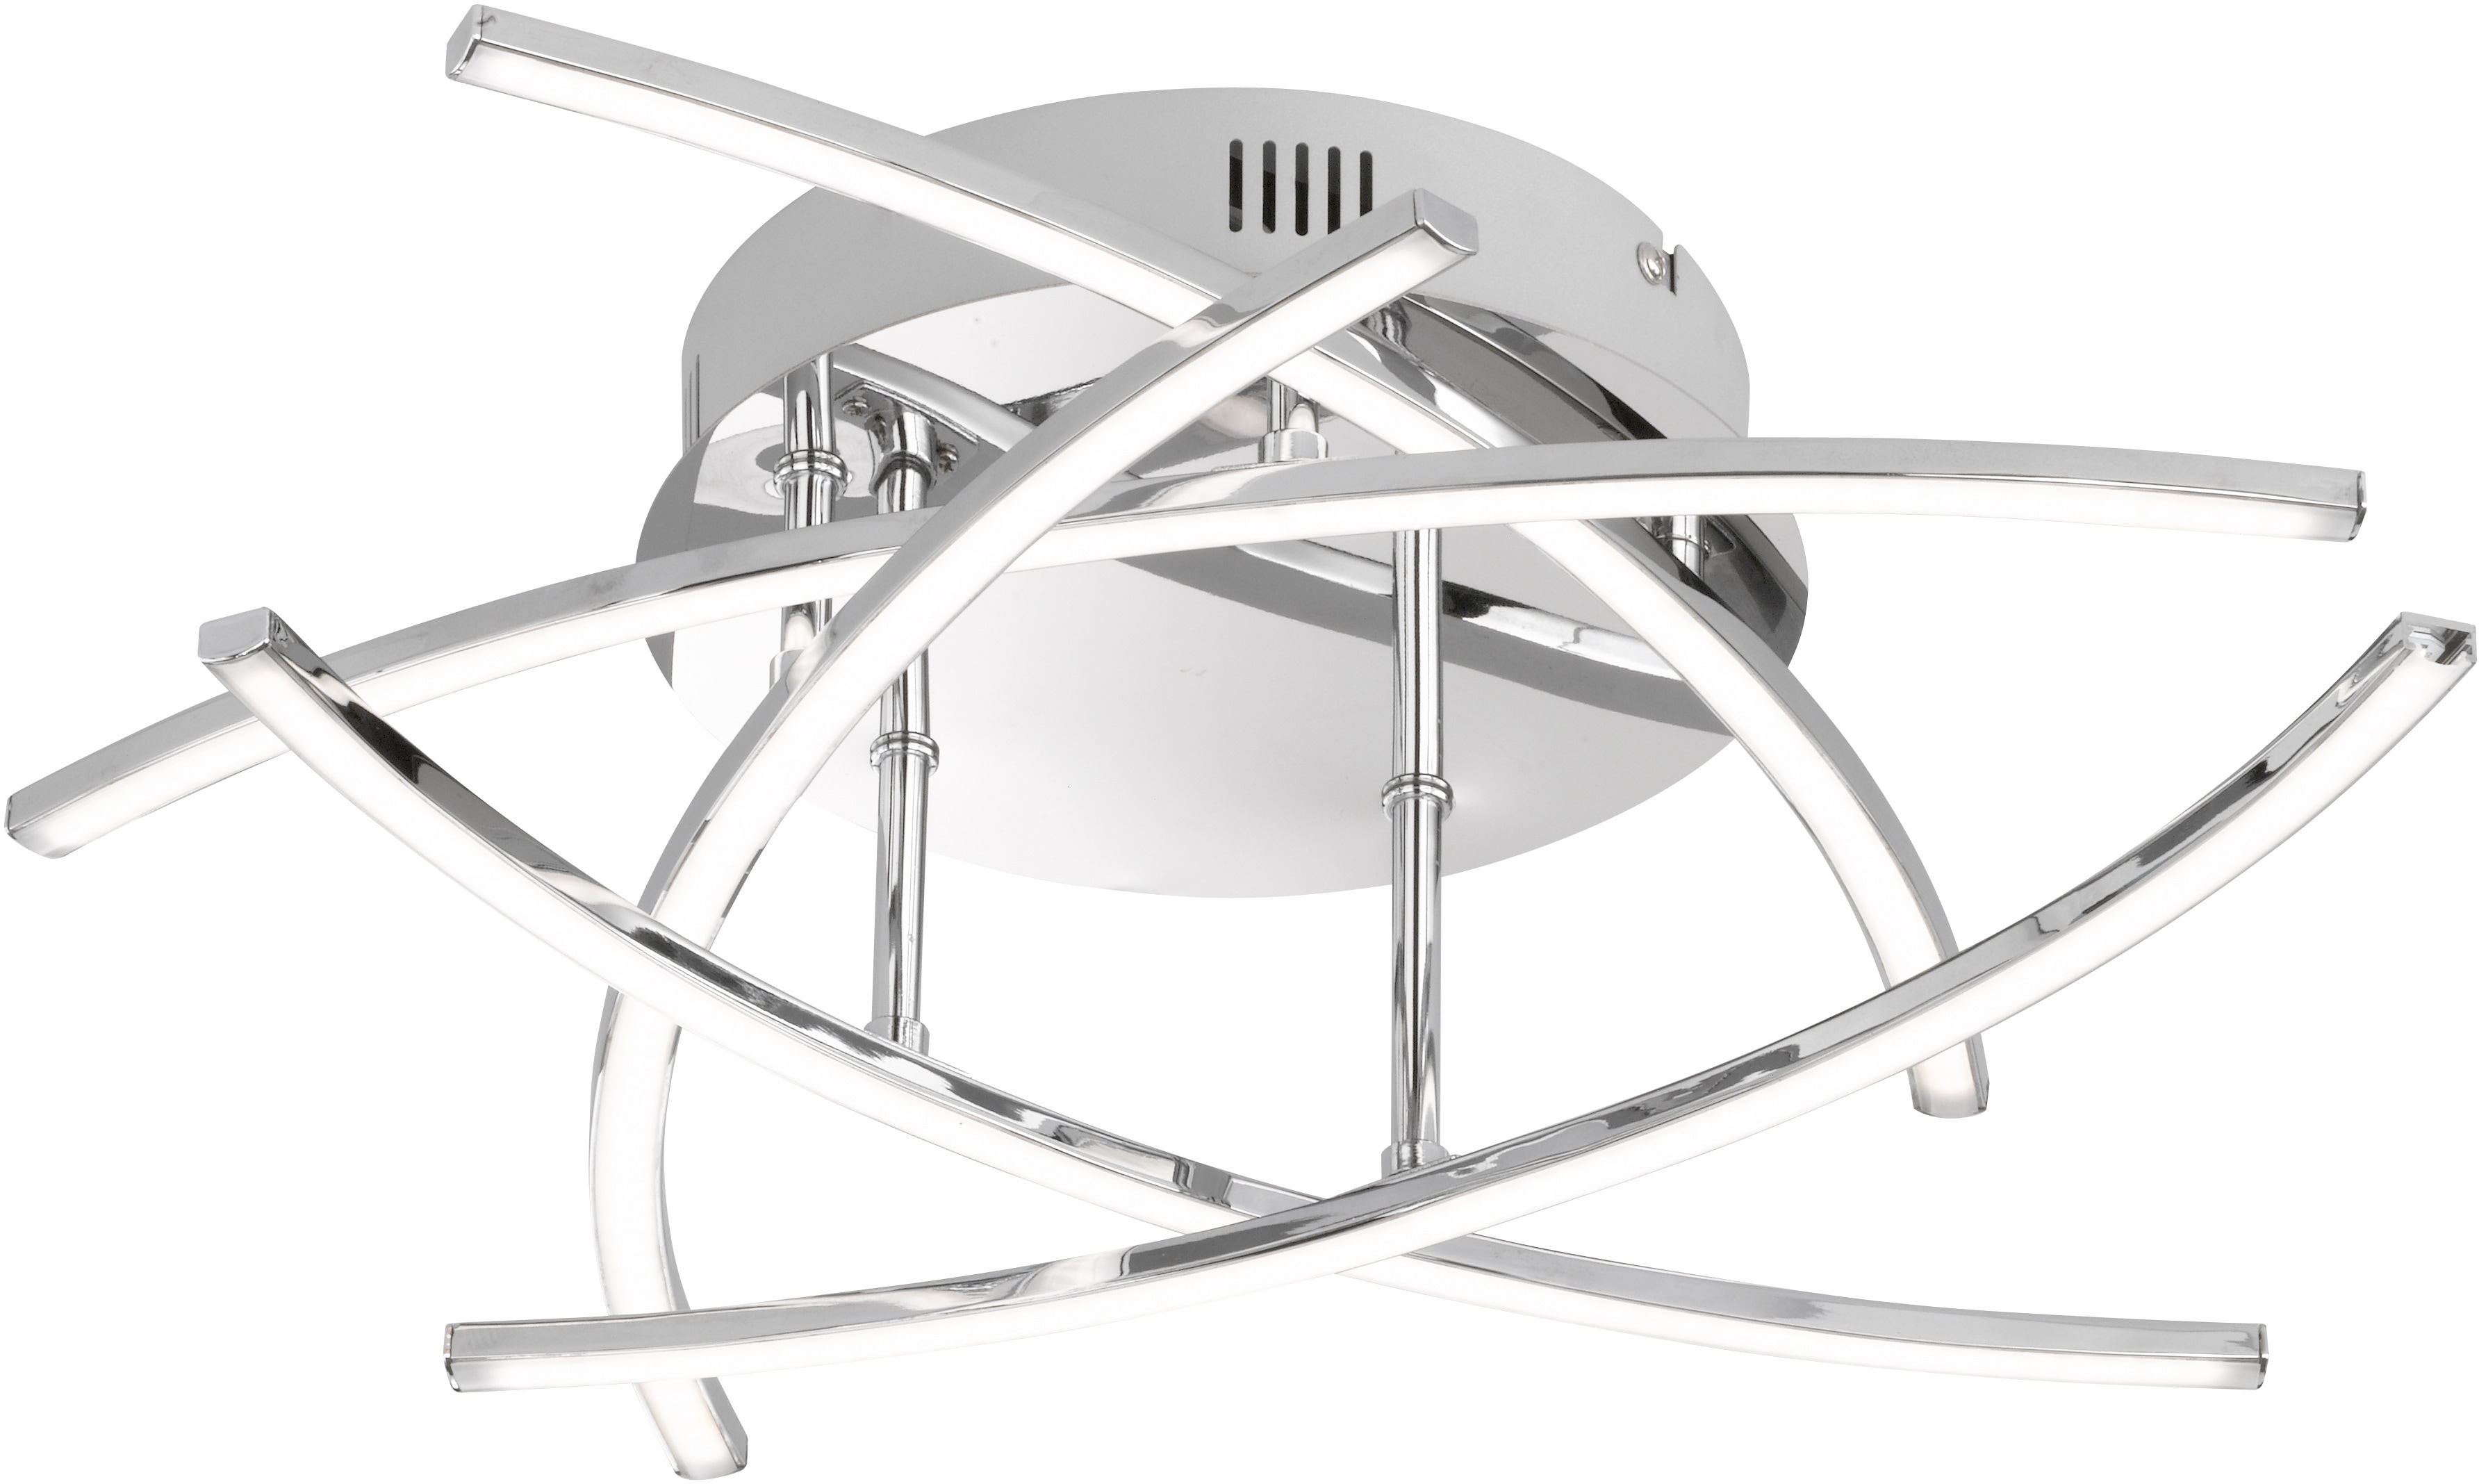 FISCHER & HONSEL LED Deckenleuchte Cross, LED-Modul, Warmweiß